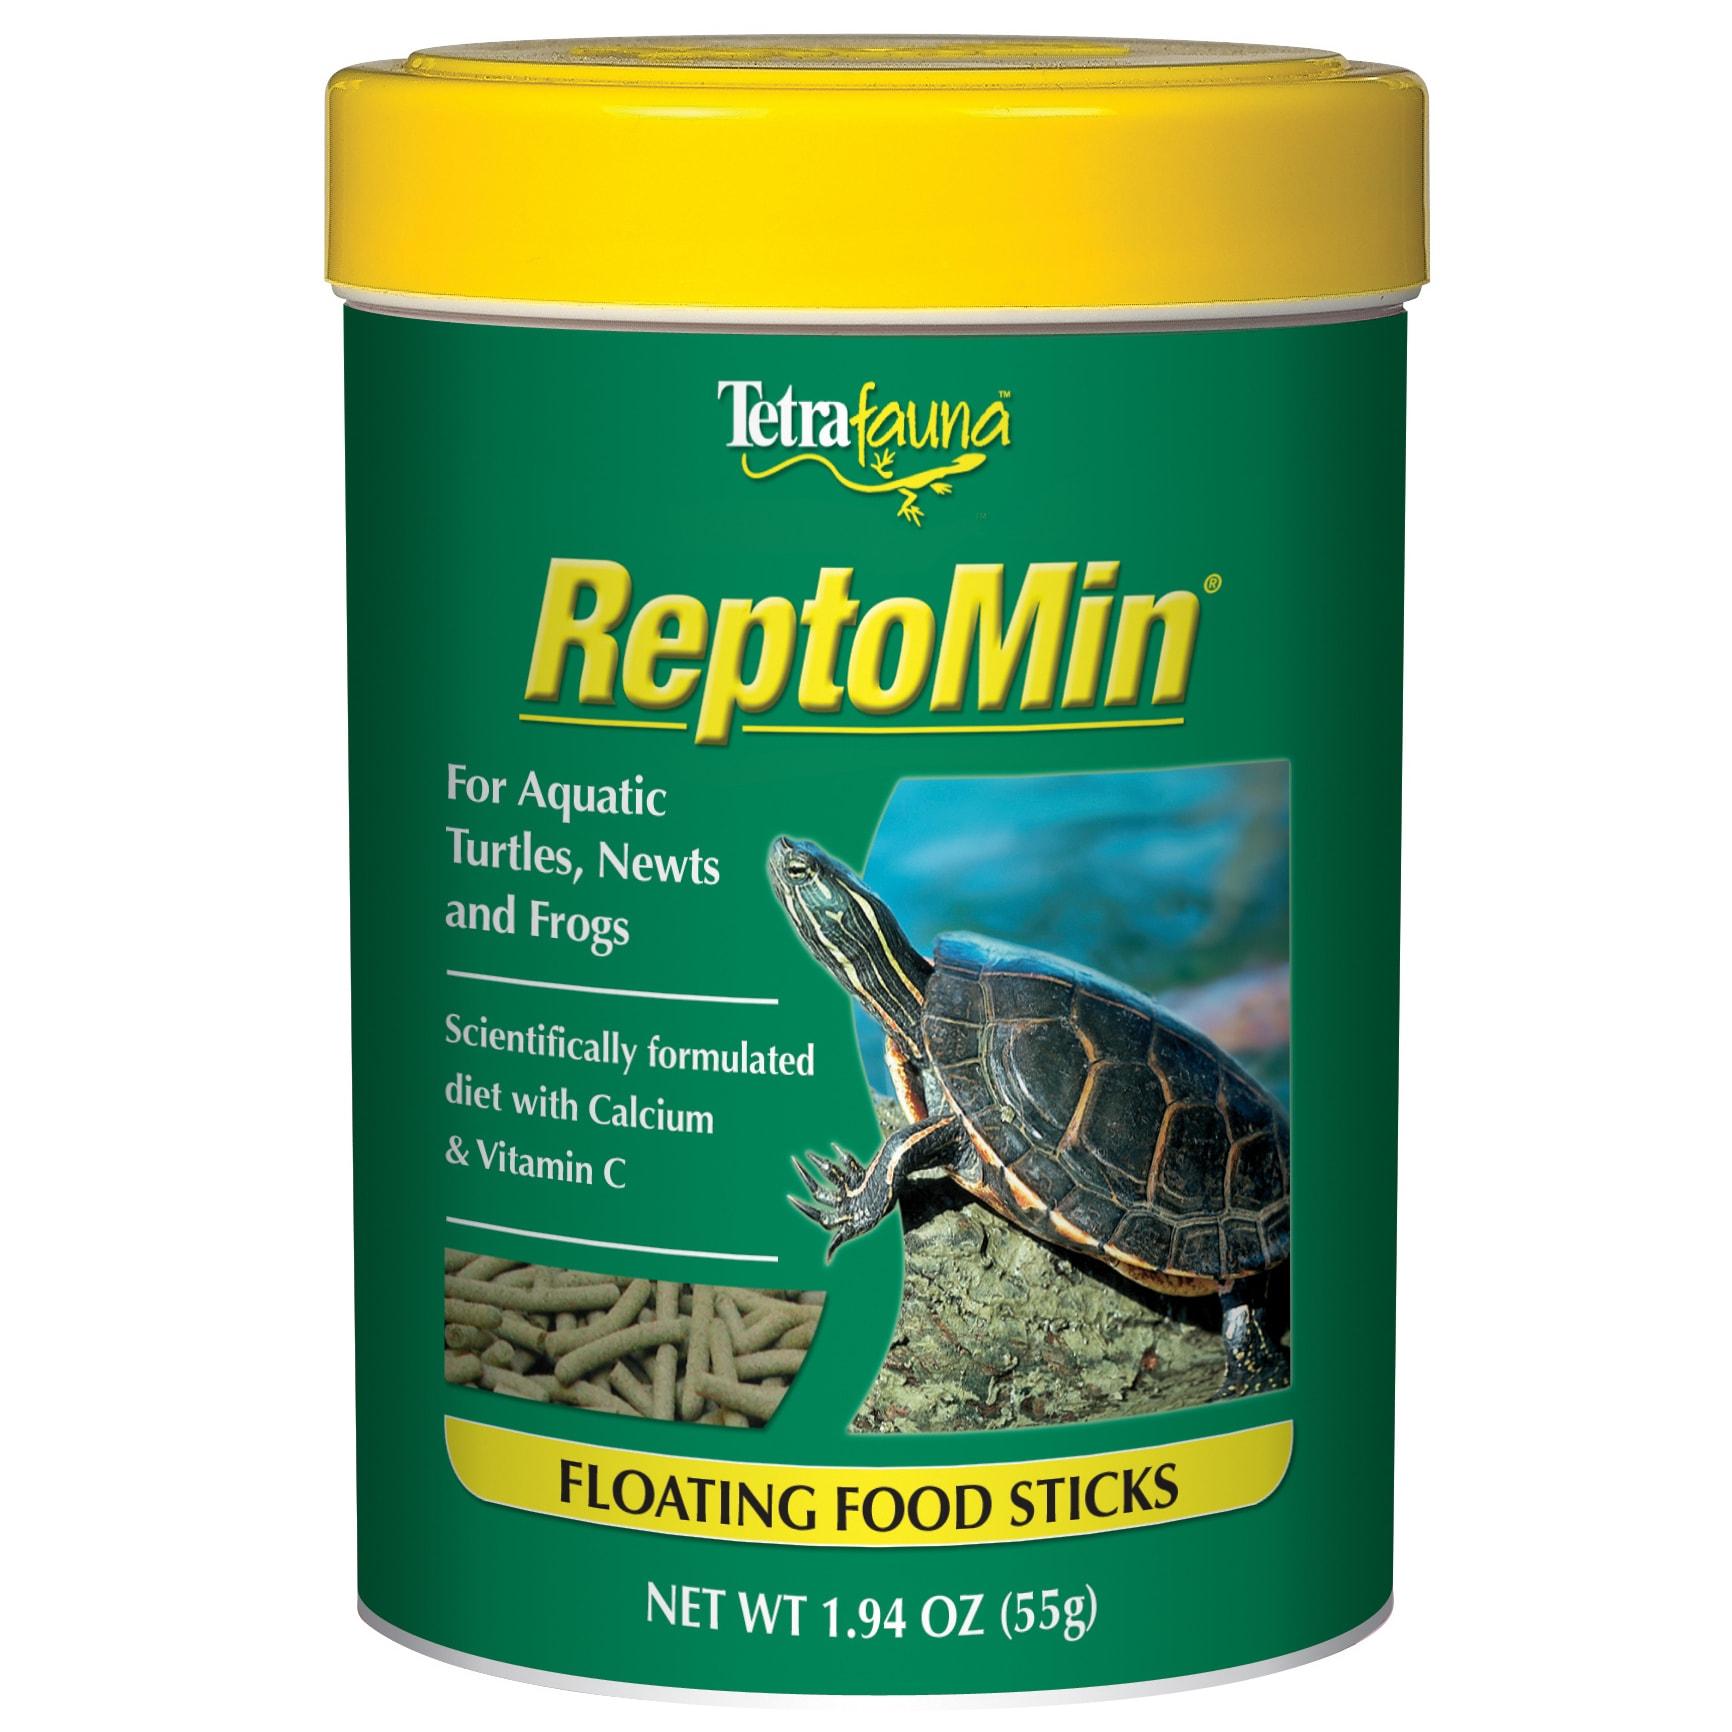 Tetrapond ReptoMin Sticks (ReptoMin Sticks), Green